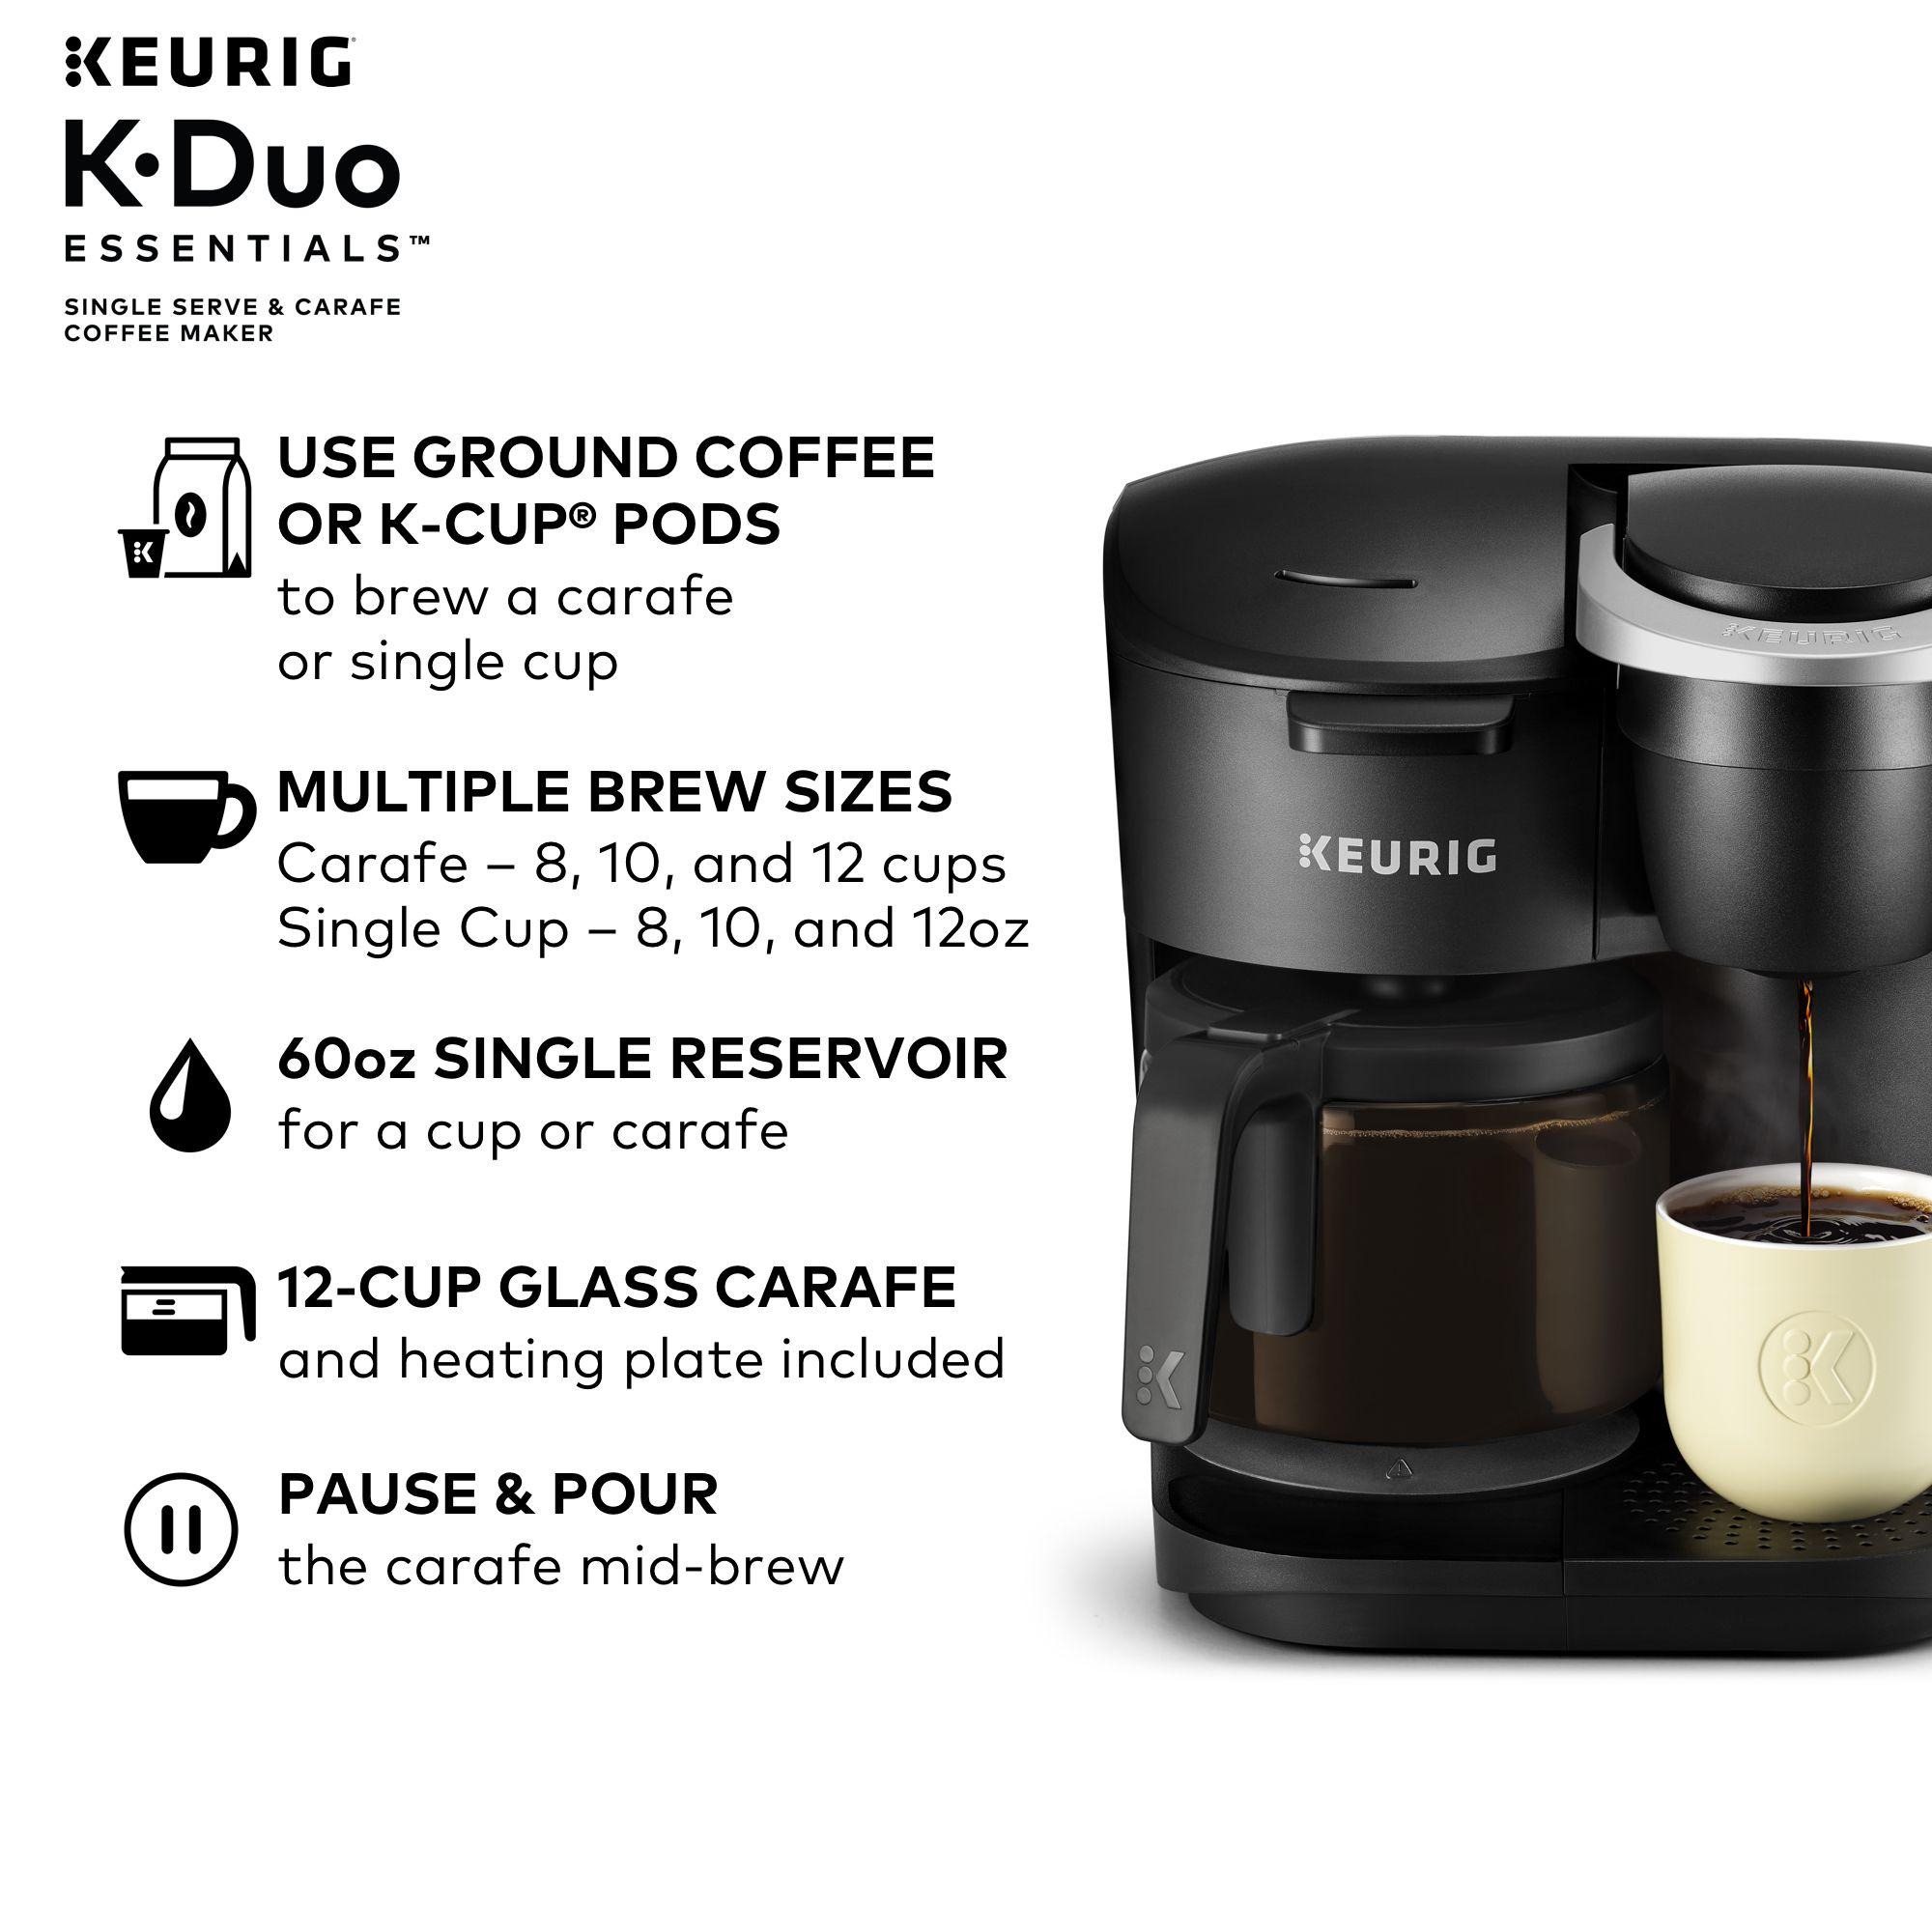 Keurig K Duo Essentials Coffee Maker Replacement Carafe in